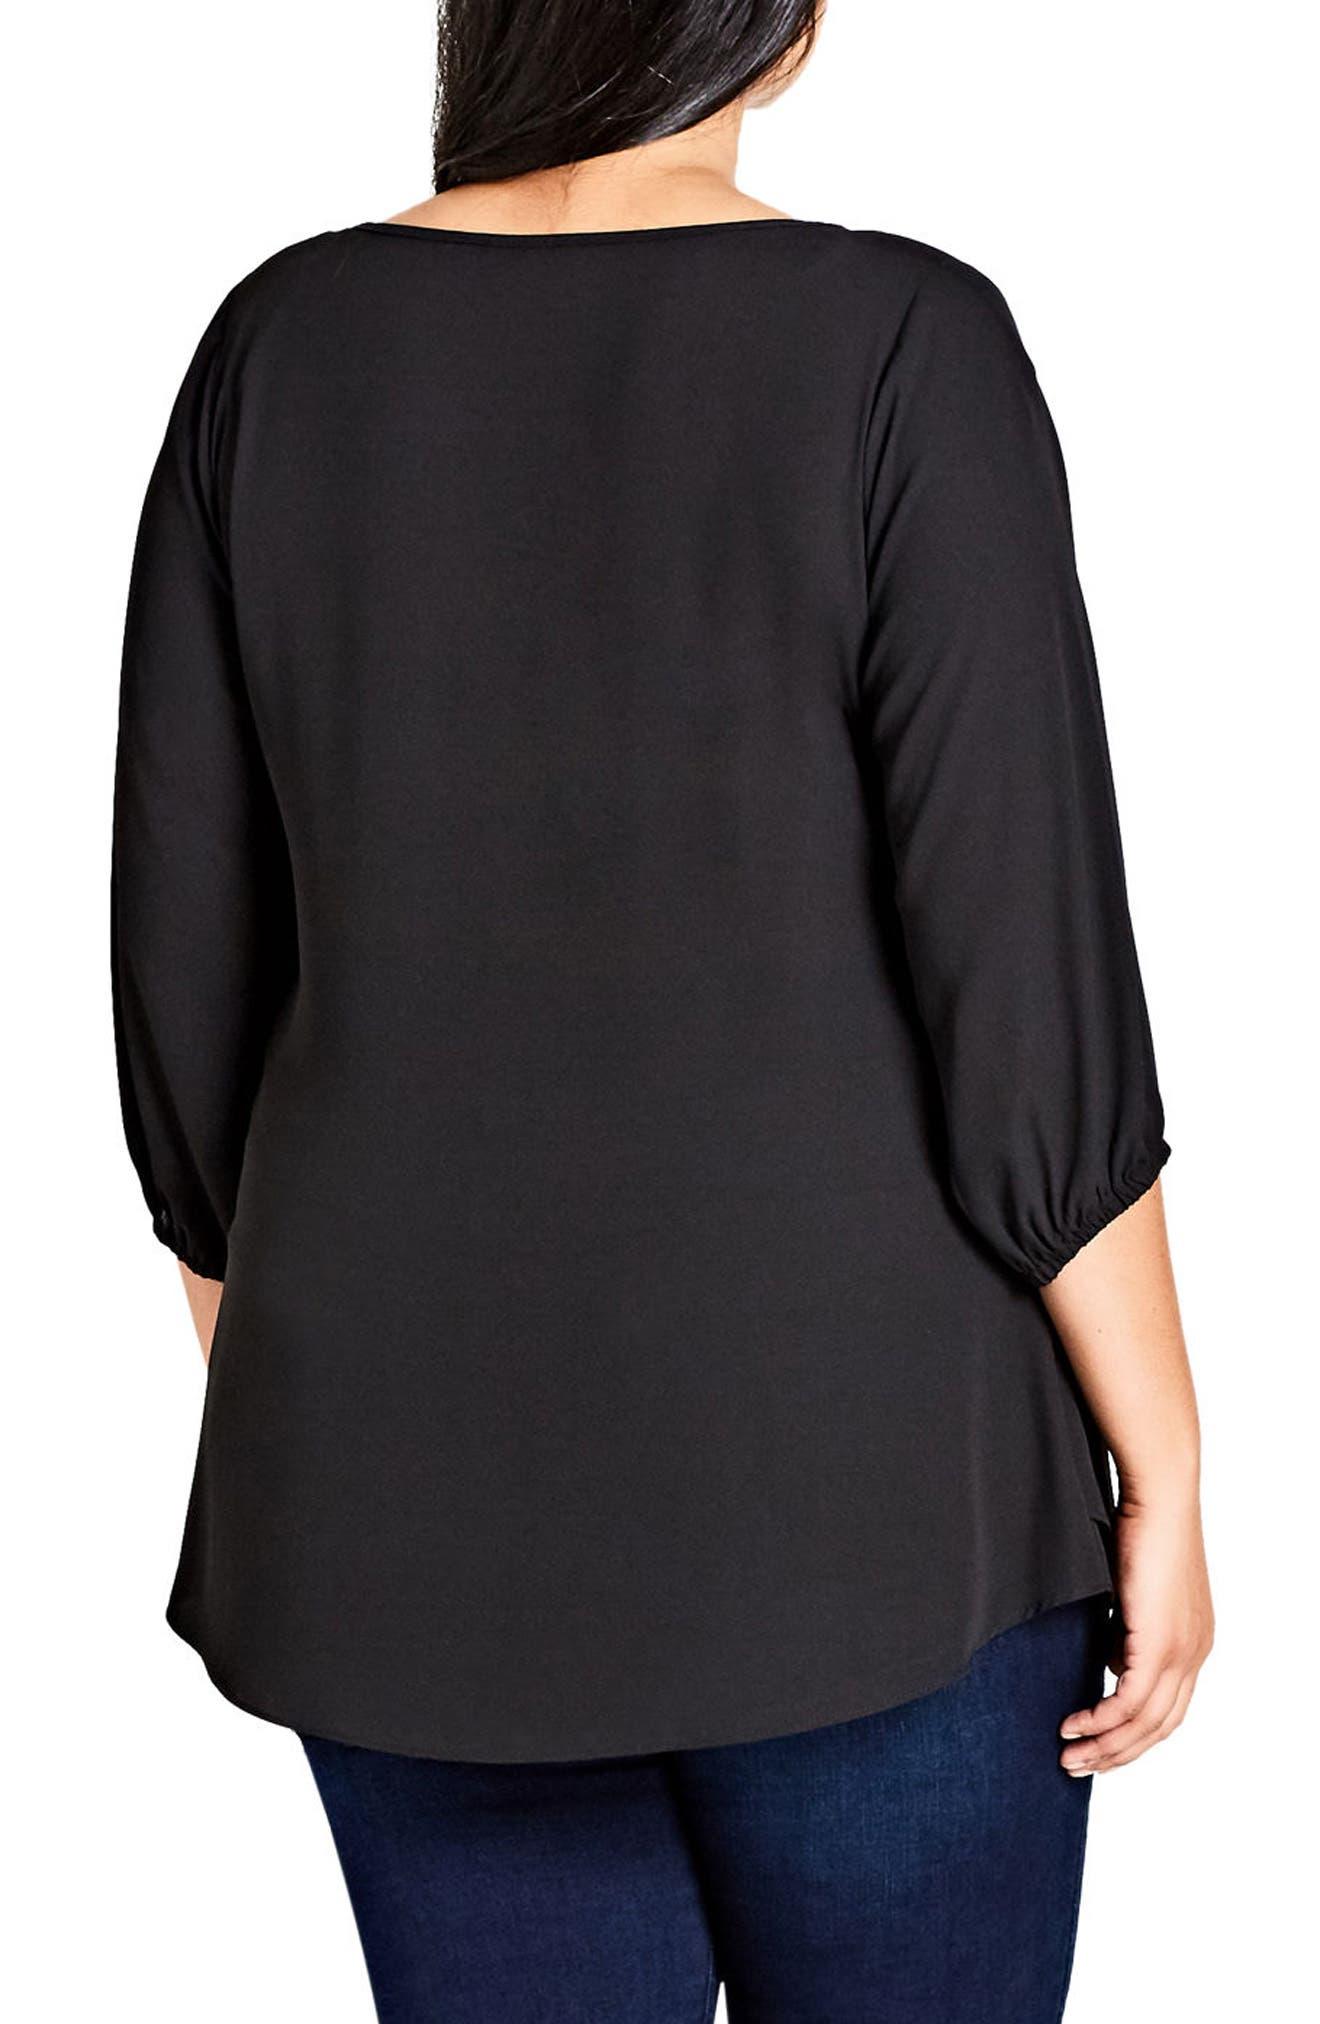 f1c86c5c3f09 Women's Plus-Size Tops | Nordstrom